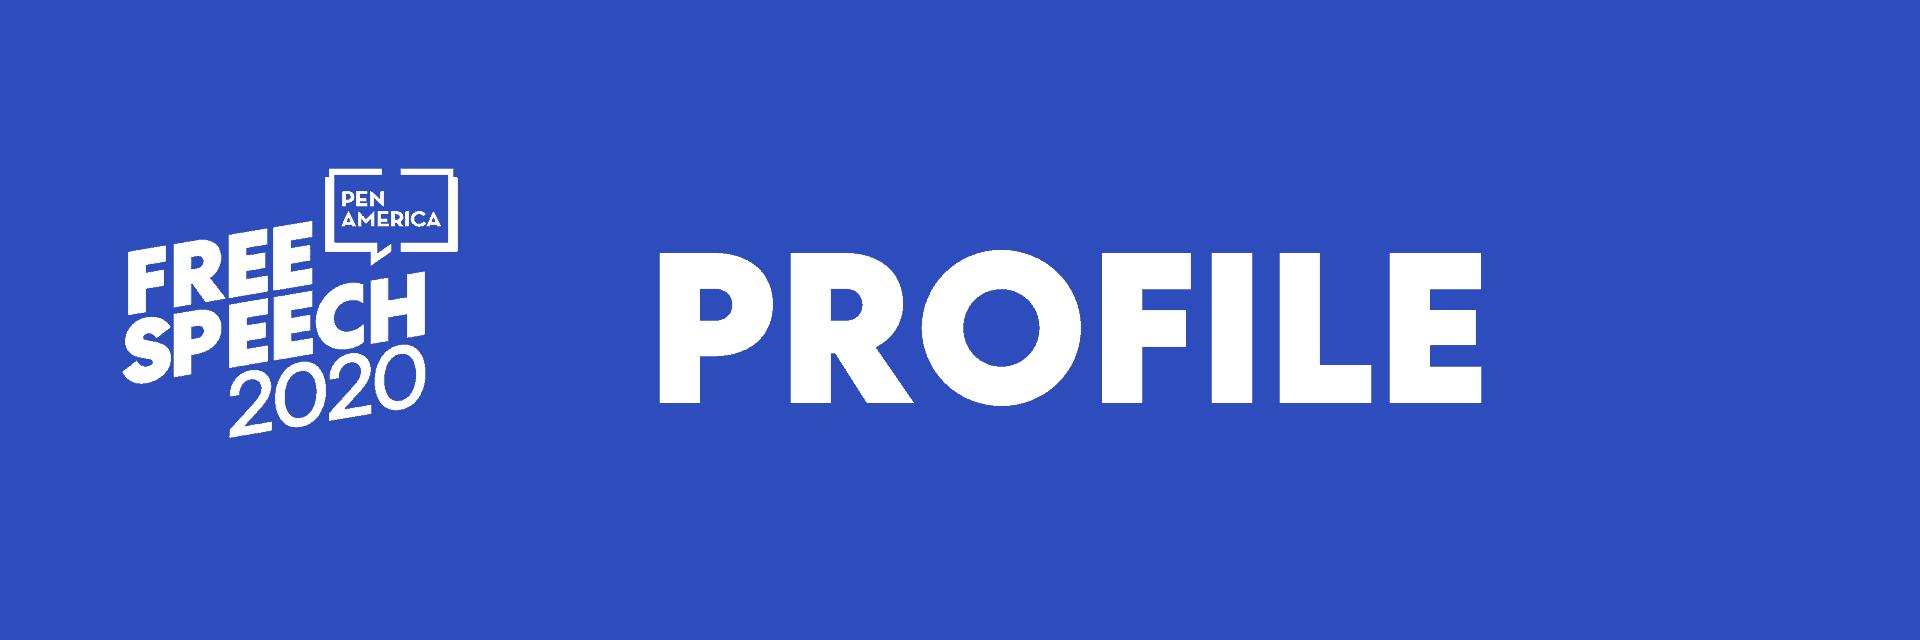 Free Speech 2020: PEN Profiles Header